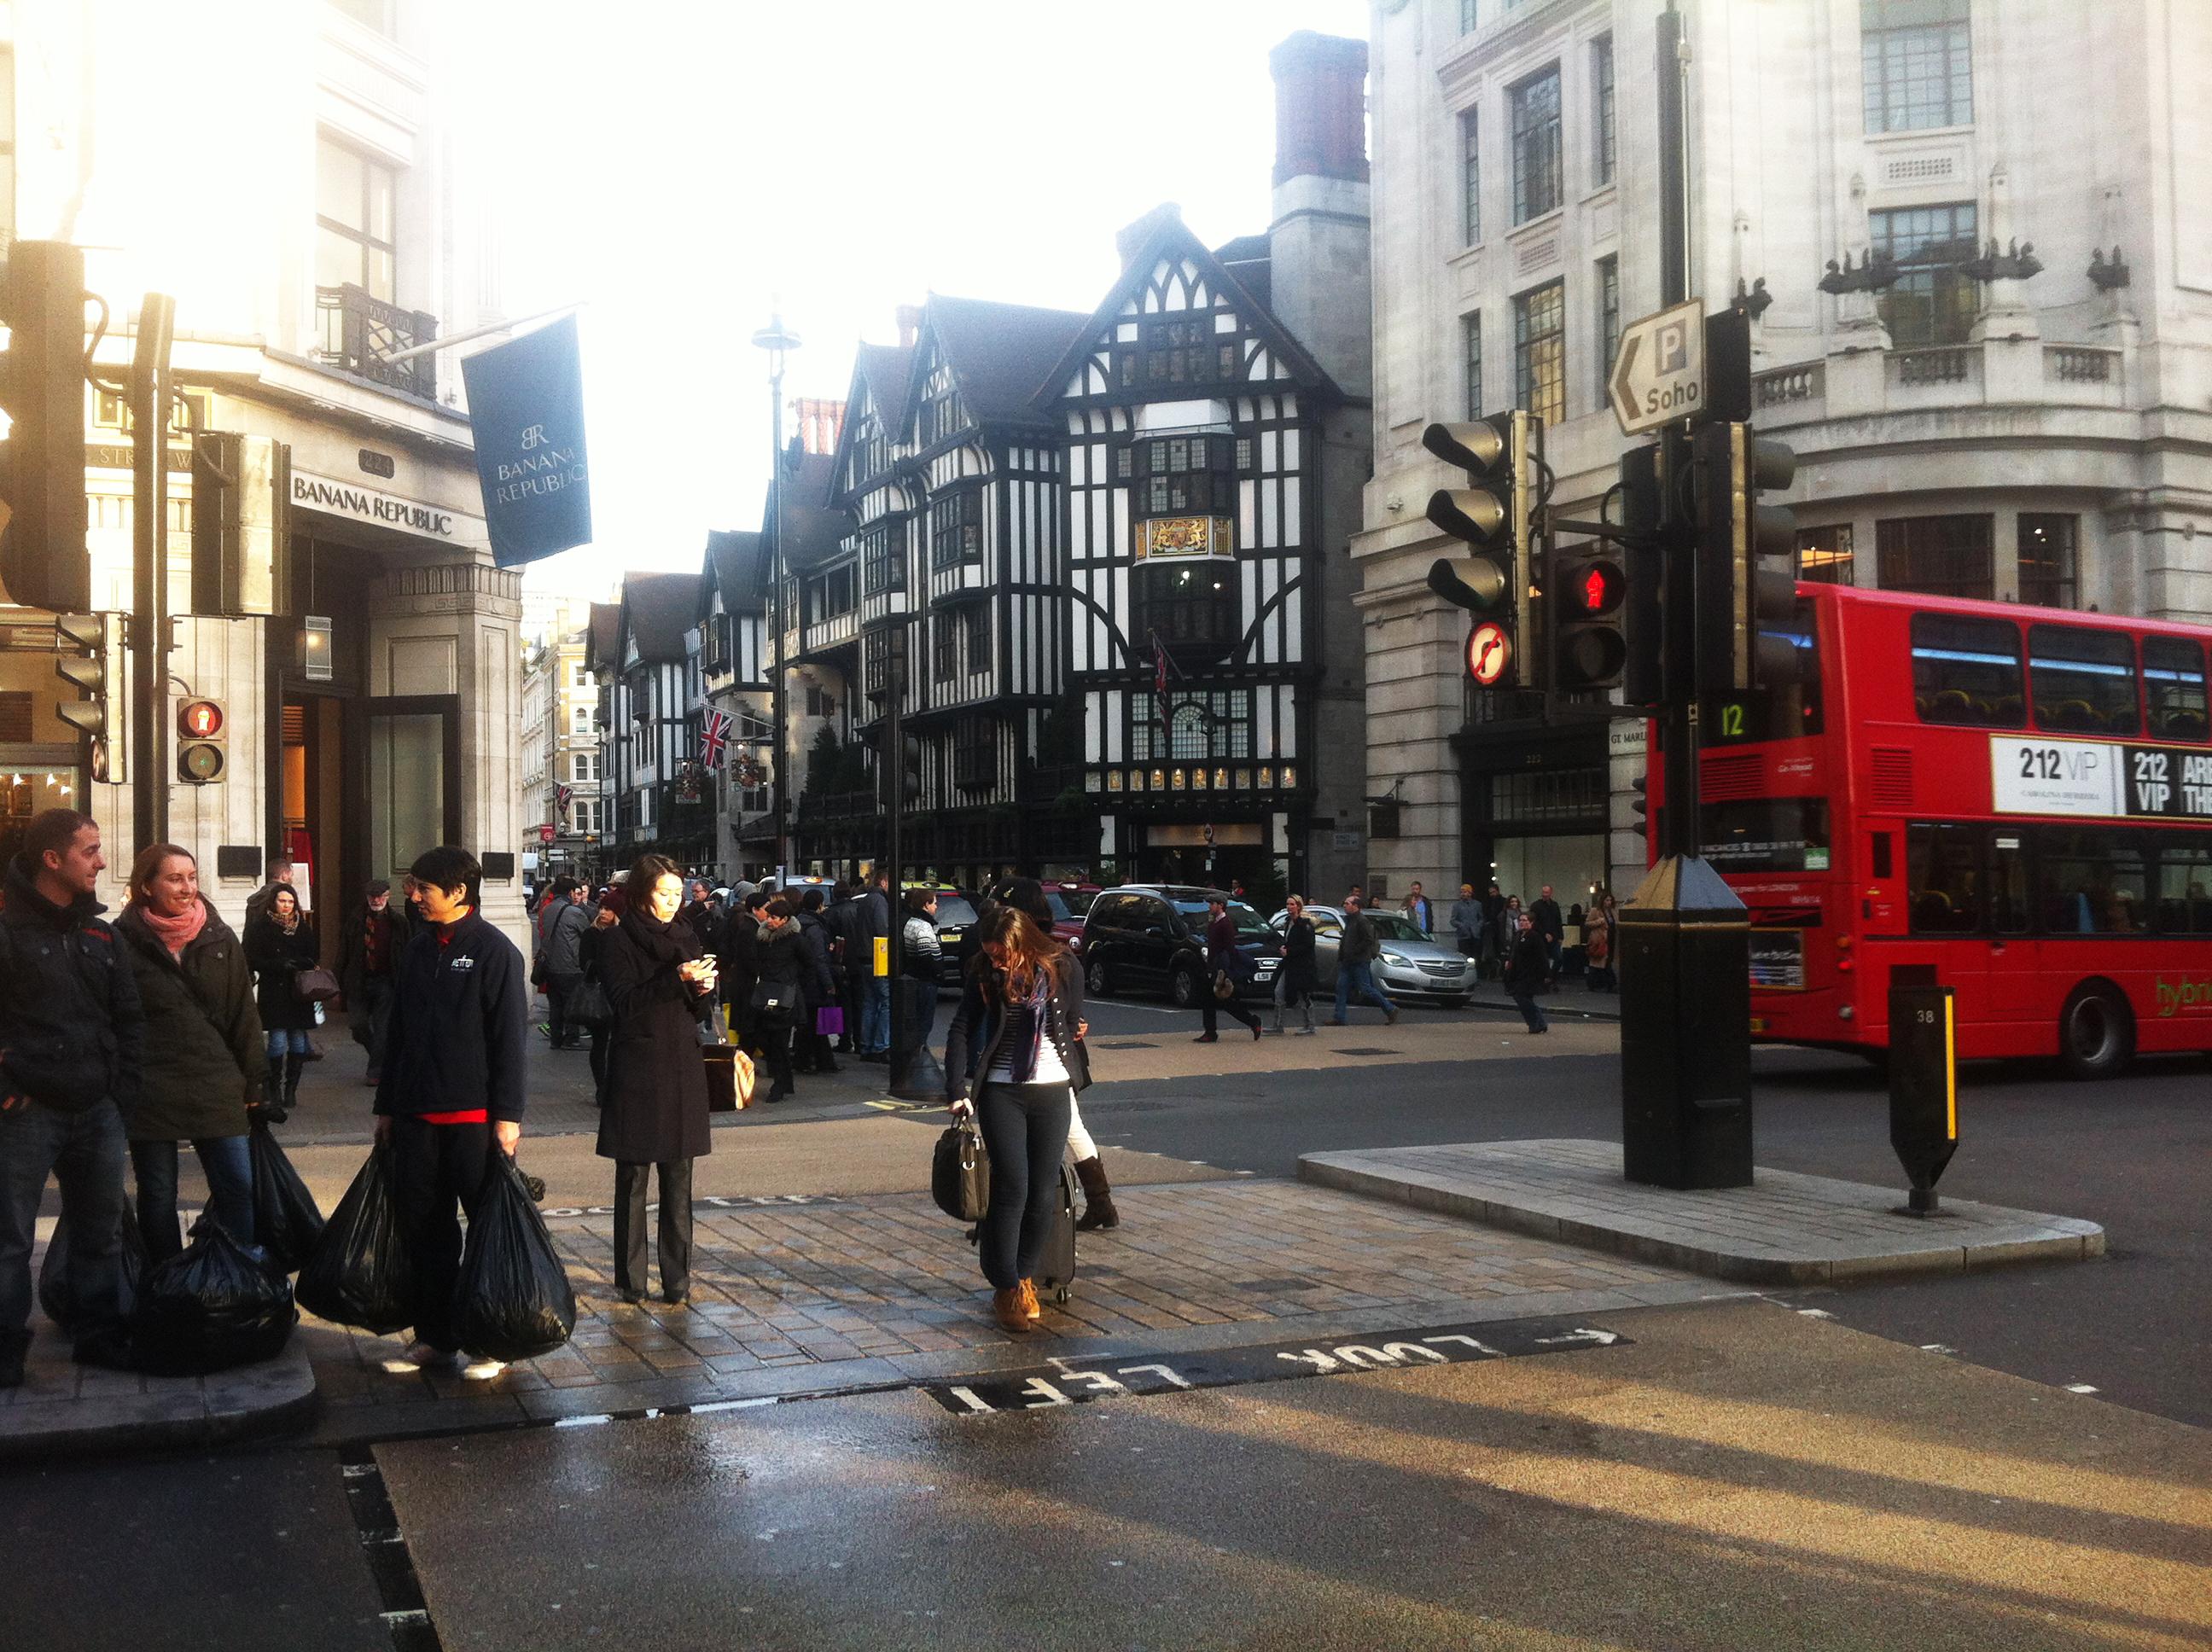 londres calles de compras